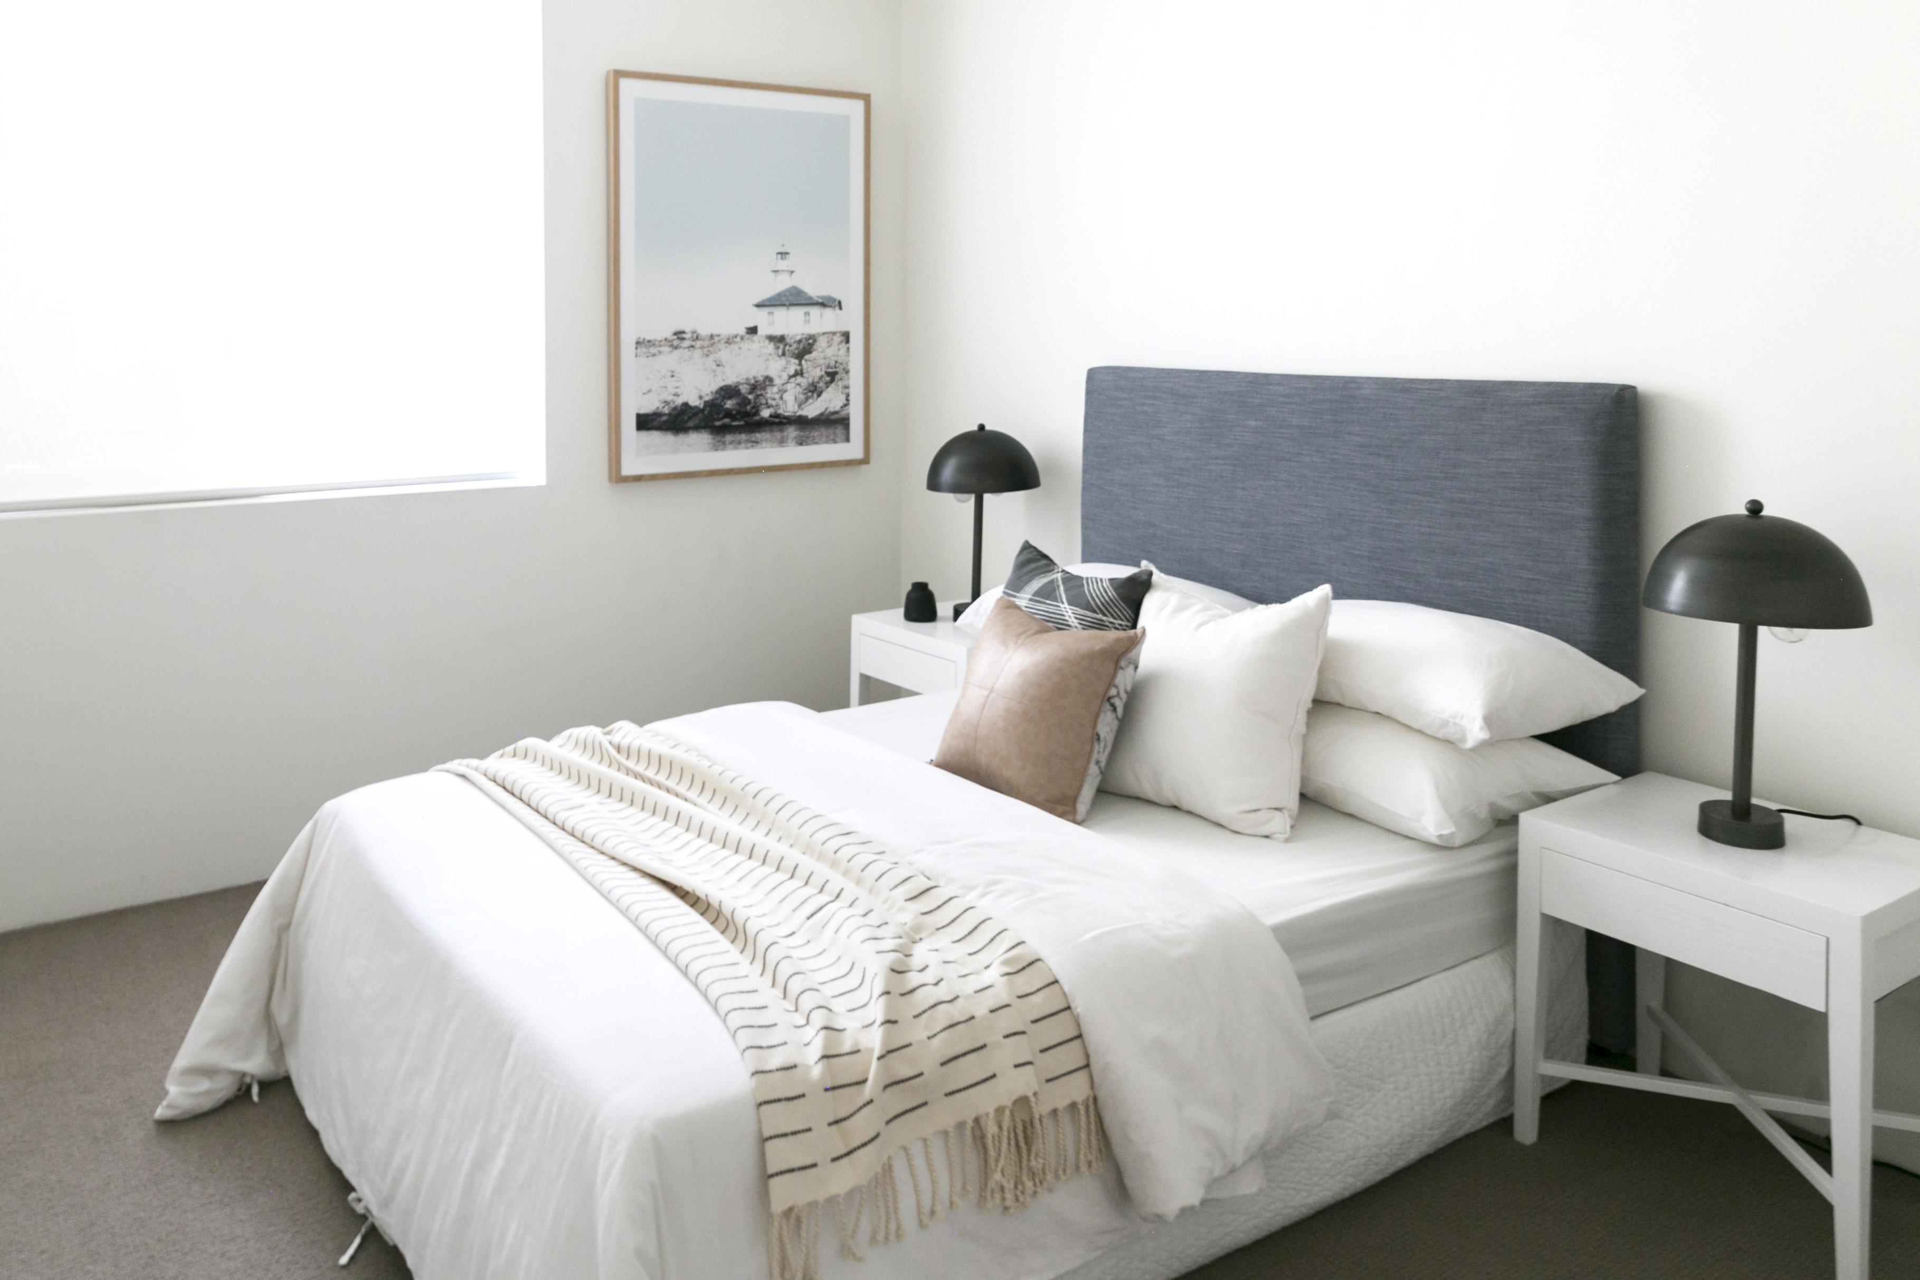 Sydney's Sutherland Shire Interior Designers | Advantage Interior Design